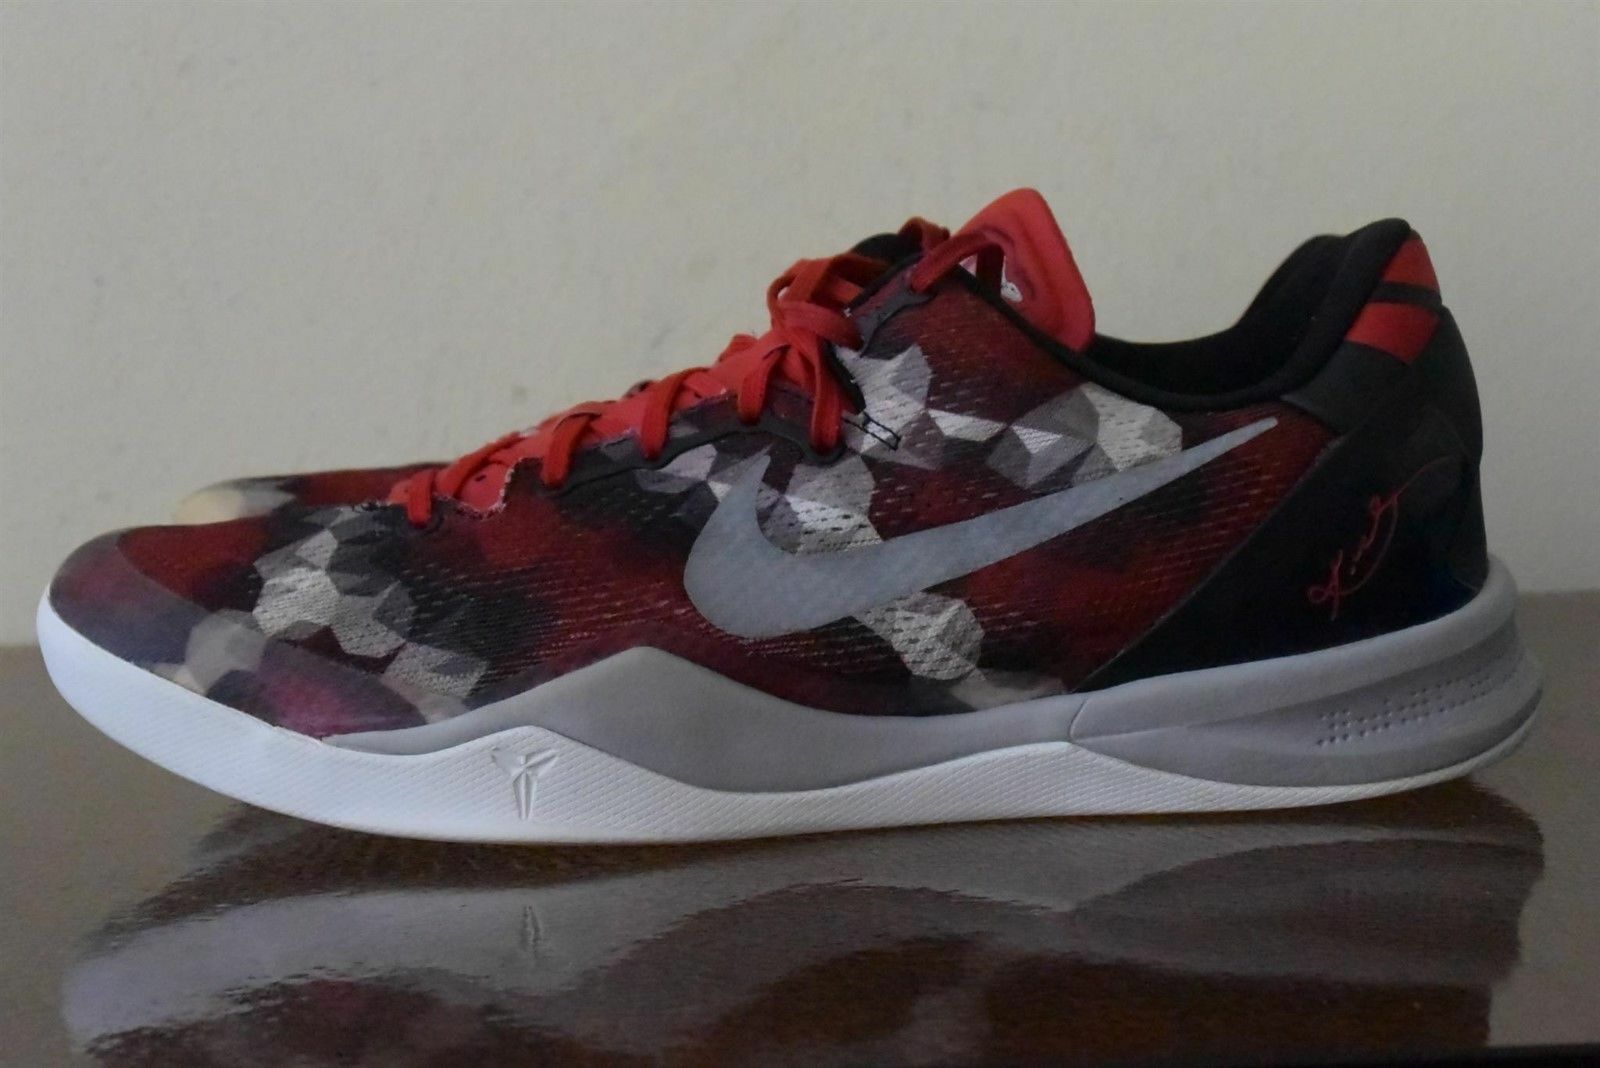 Nike Kobe 8 Milk Snake University Red Sail-Noble Red-Pearl Grey 555035-601 Sz 11